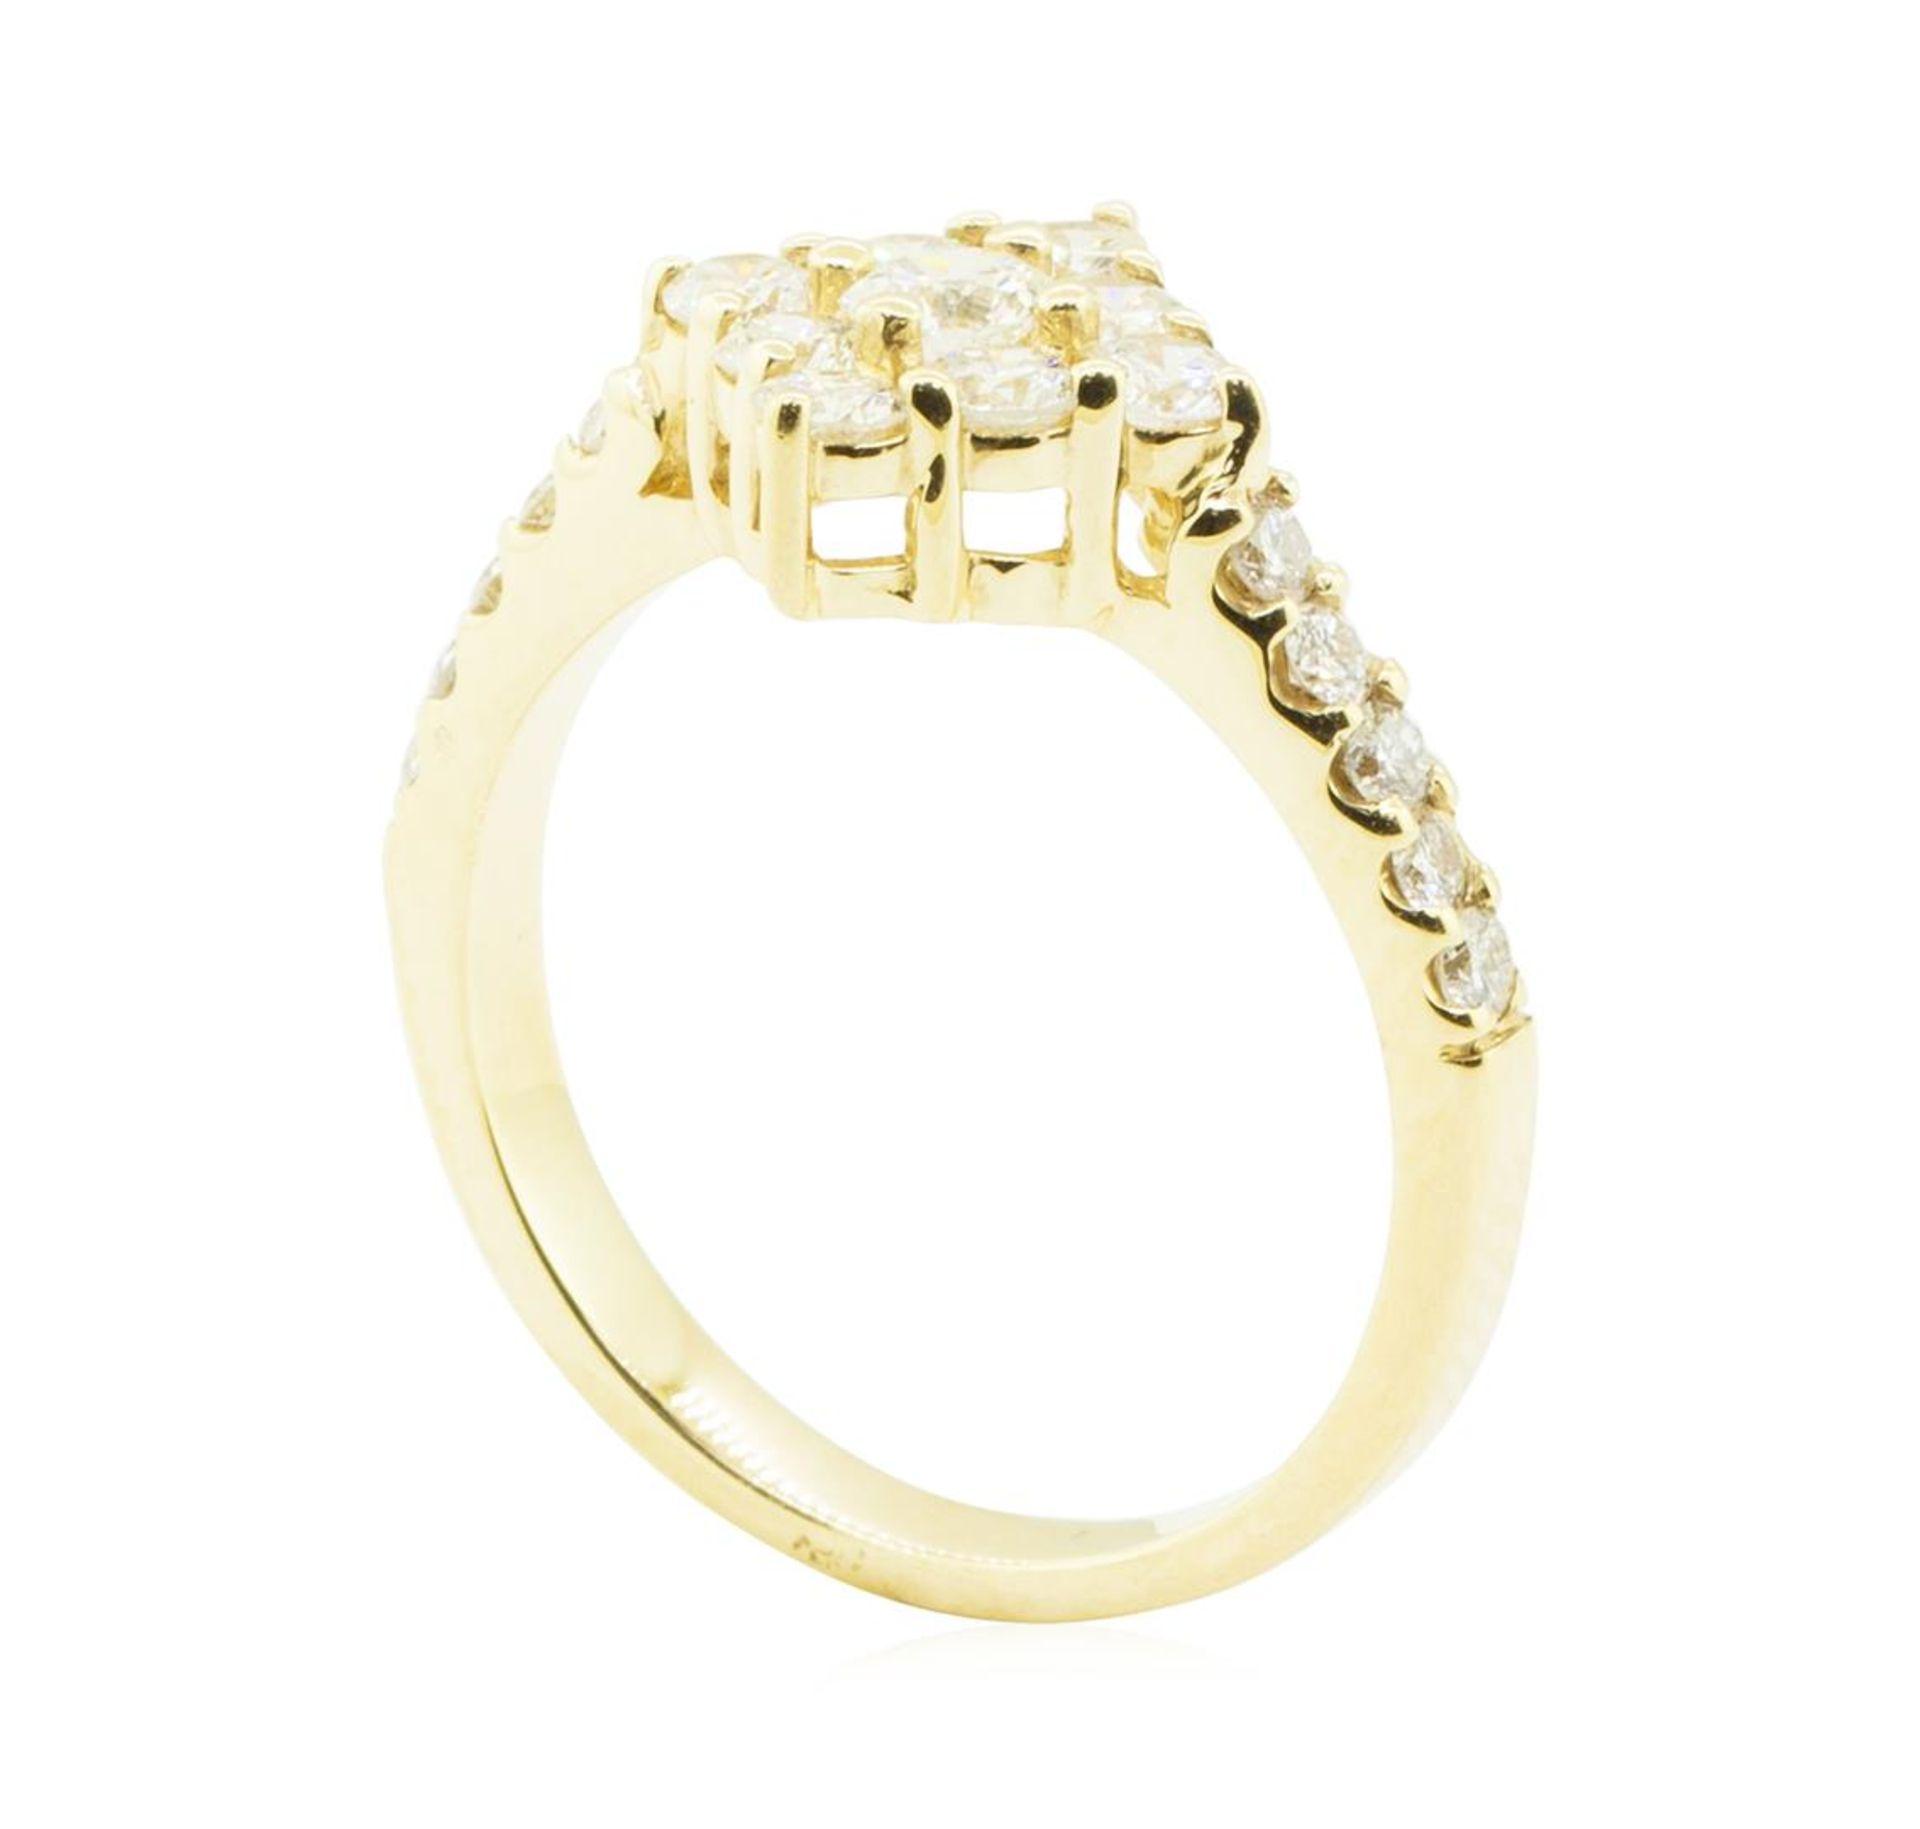 1.00 ctw Diamond Ring - 14KT Yellow Gold - Image 4 of 4